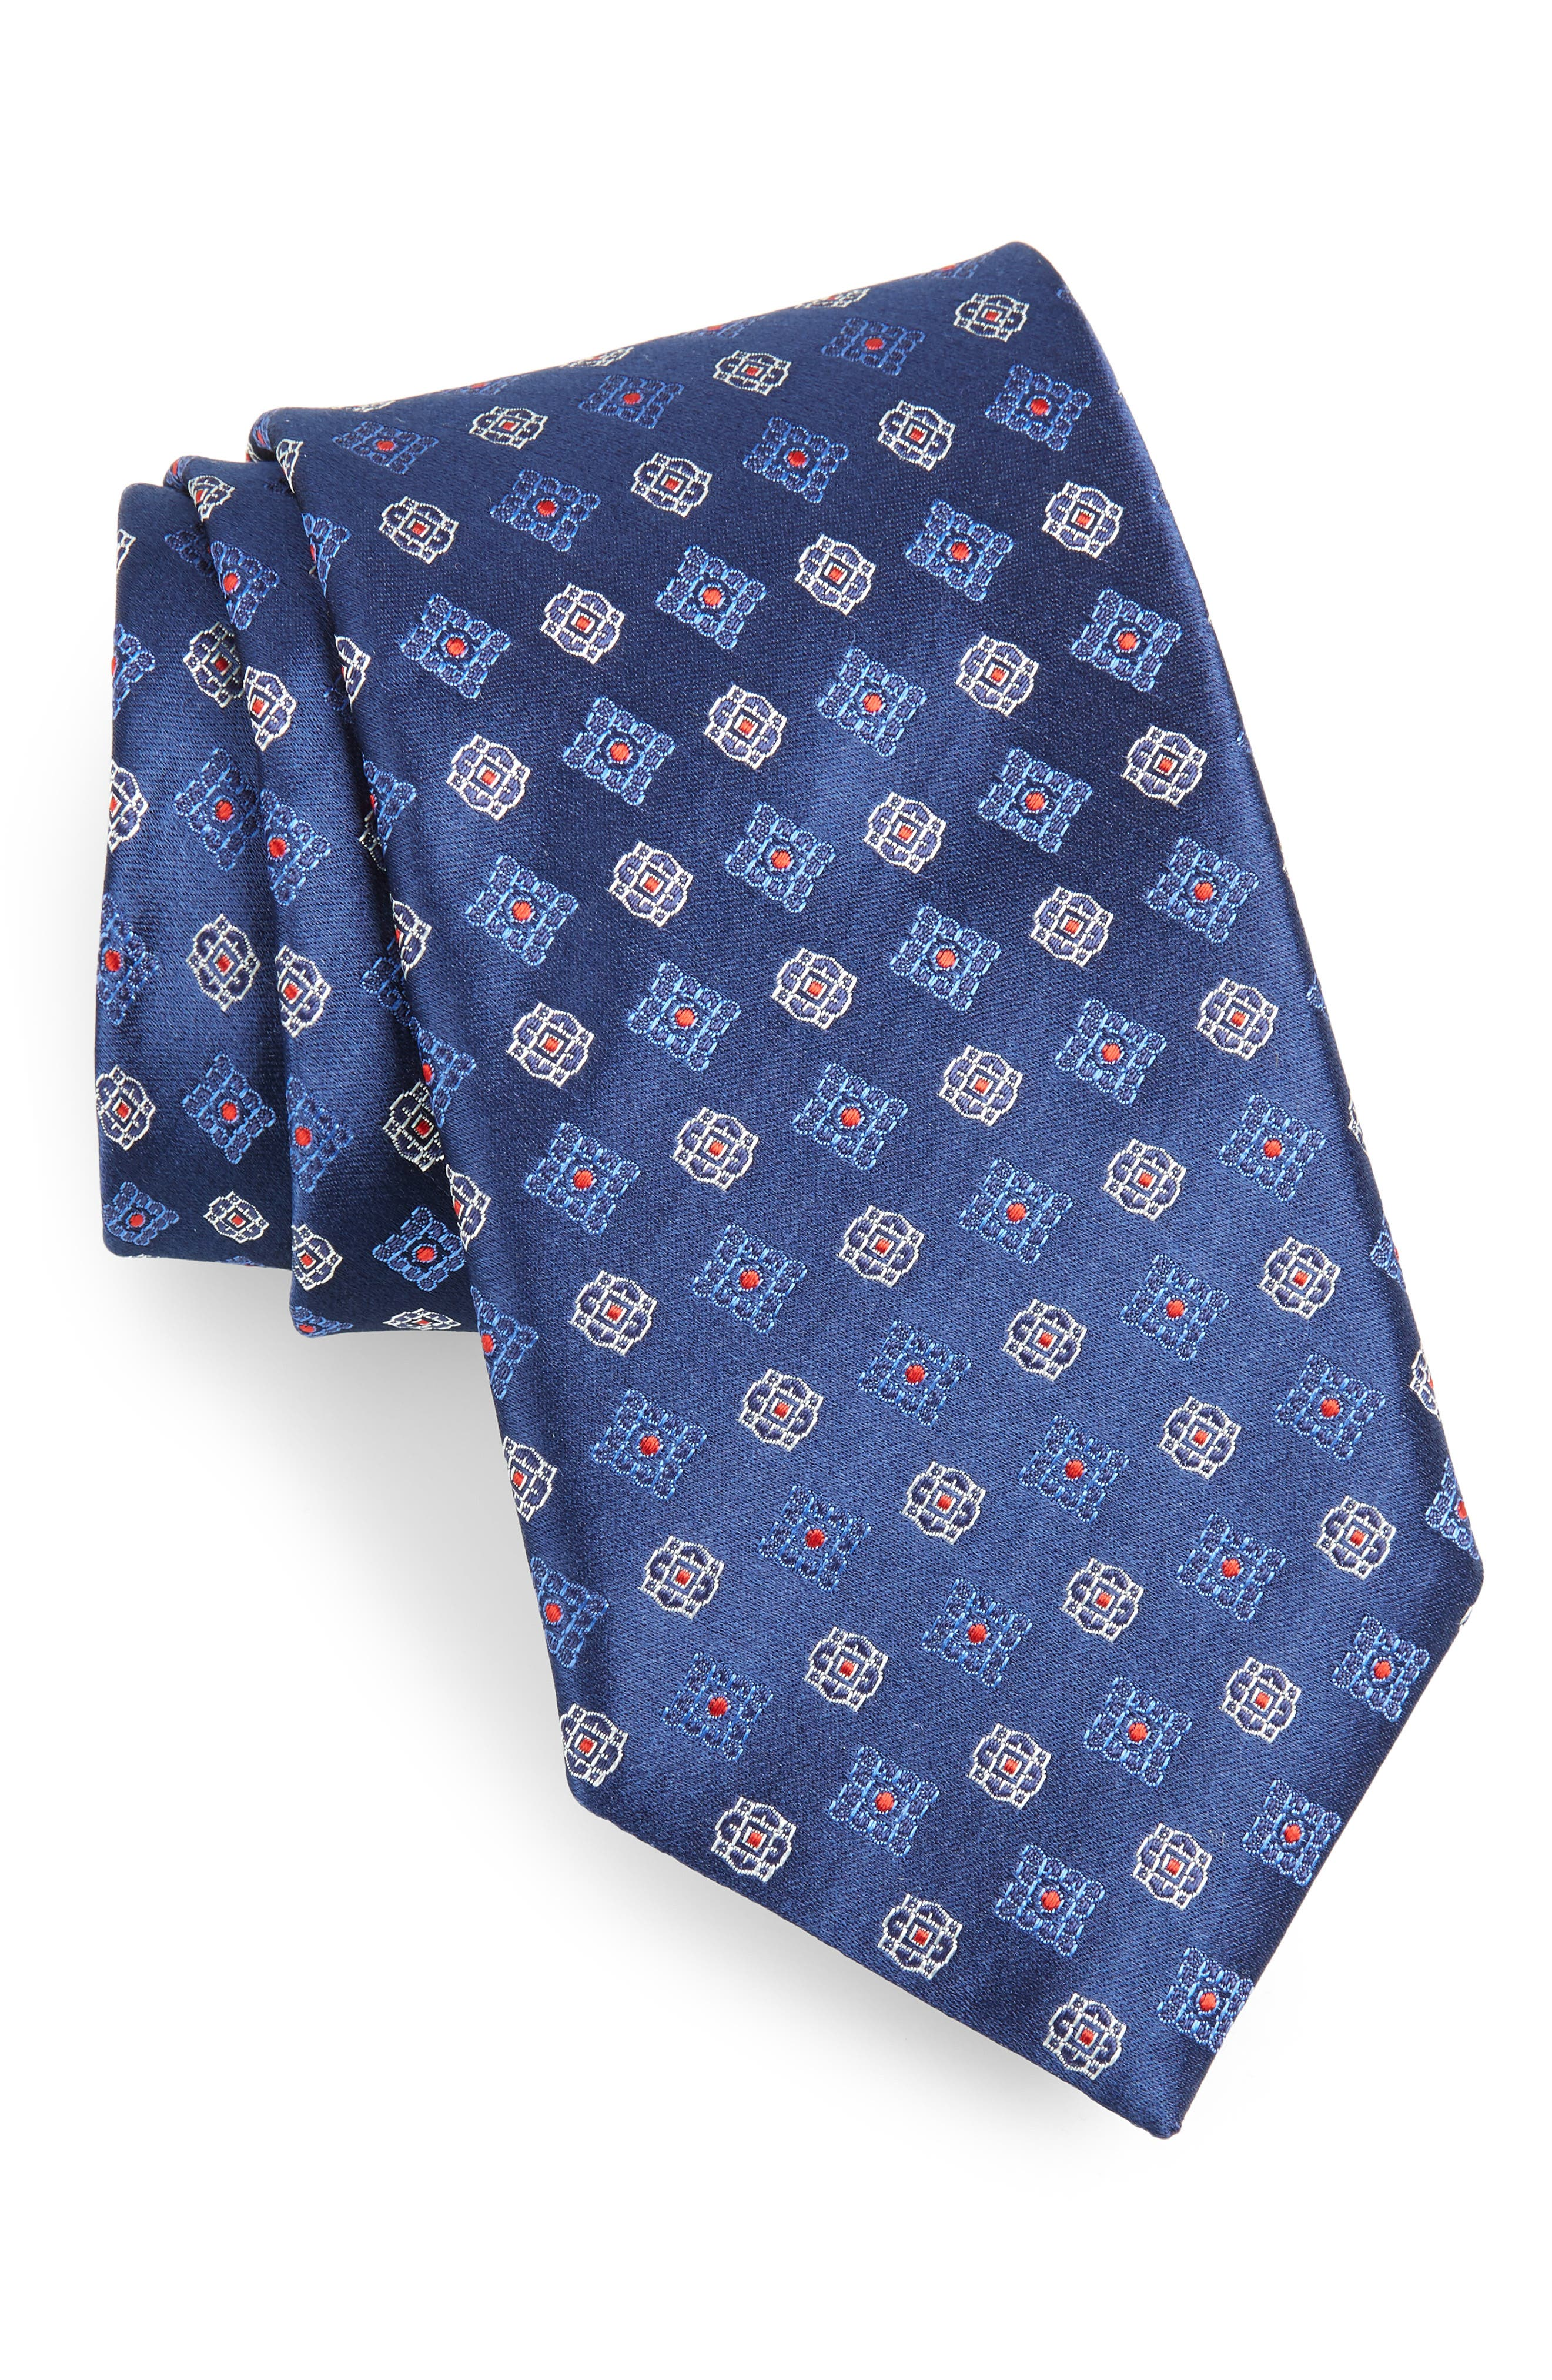 Medallion Silk Tie,                             Main thumbnail 1, color,                             NAVY